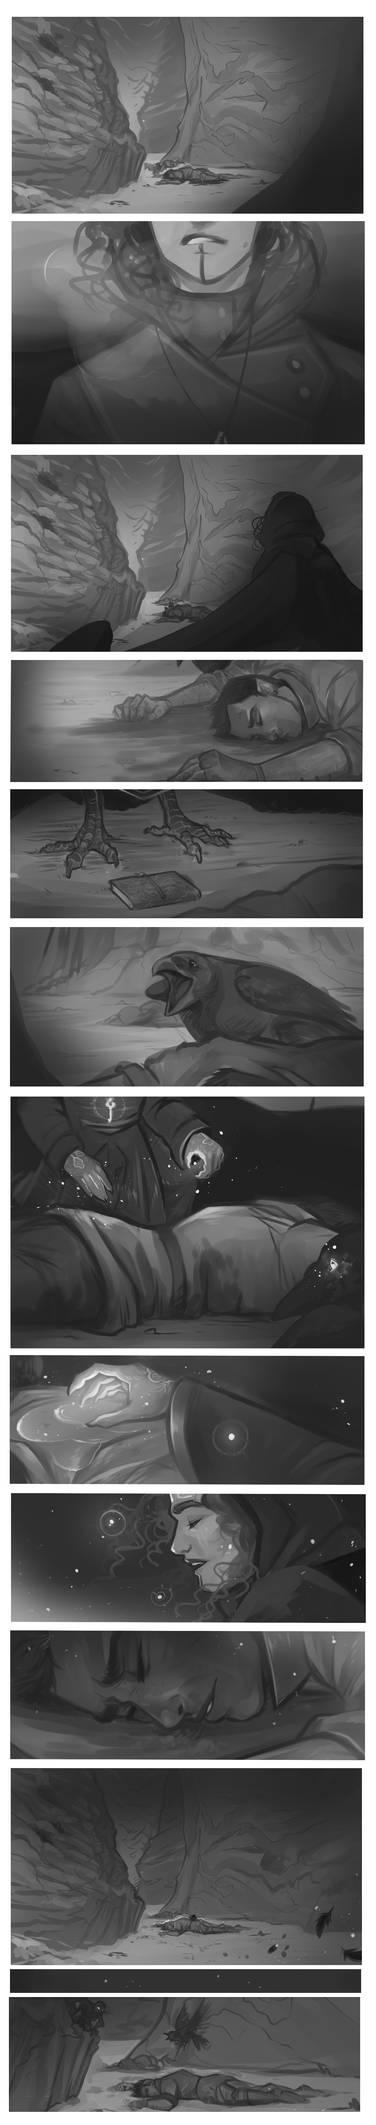 DnD|sketch comic| Not yet... by RomyvdHel-Art